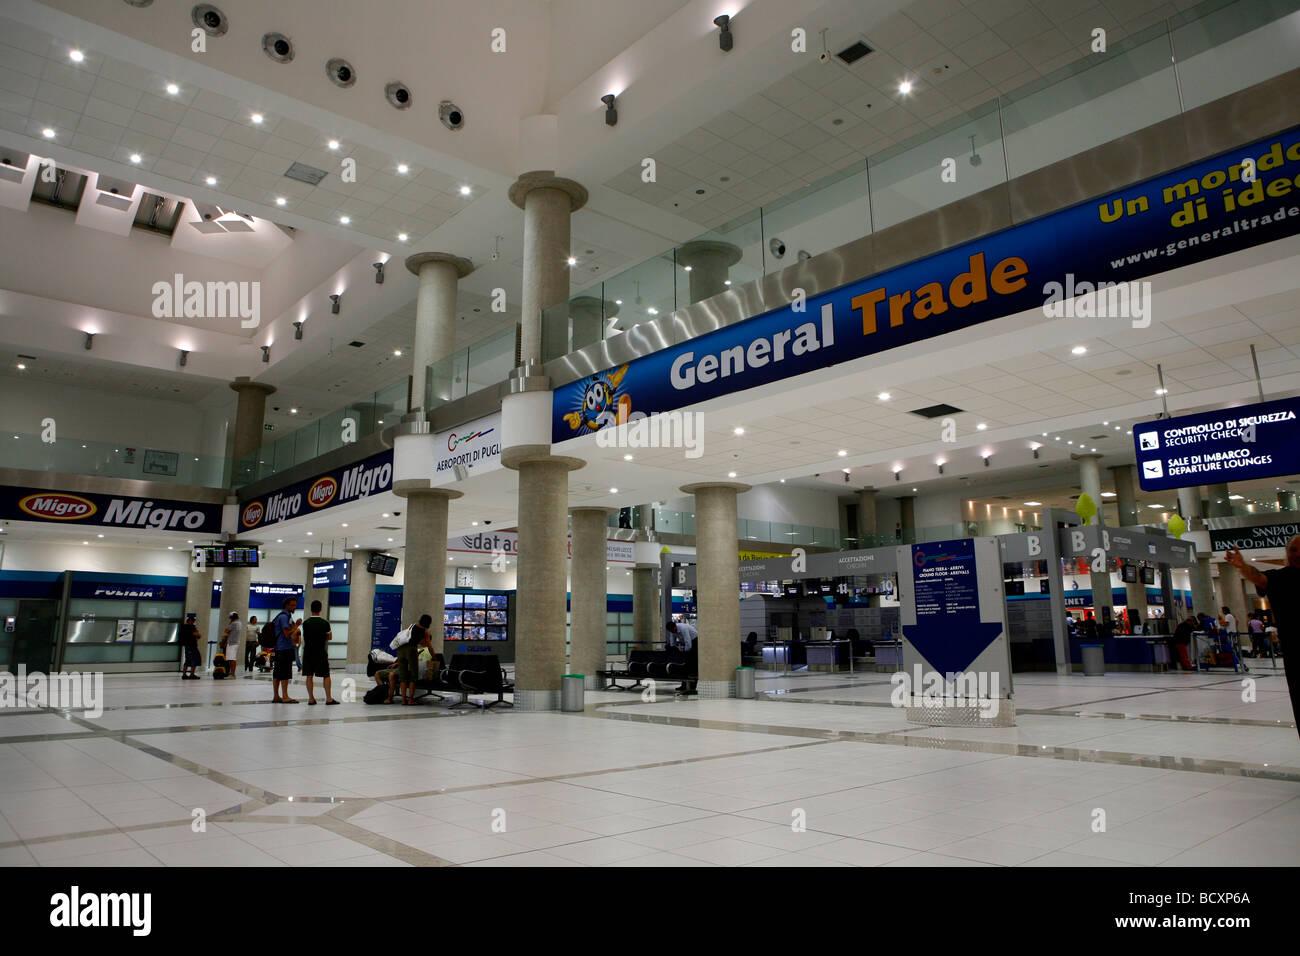 Aeroporto Bari : Aeroporto di bari stock photos aeroporto di bari stock images